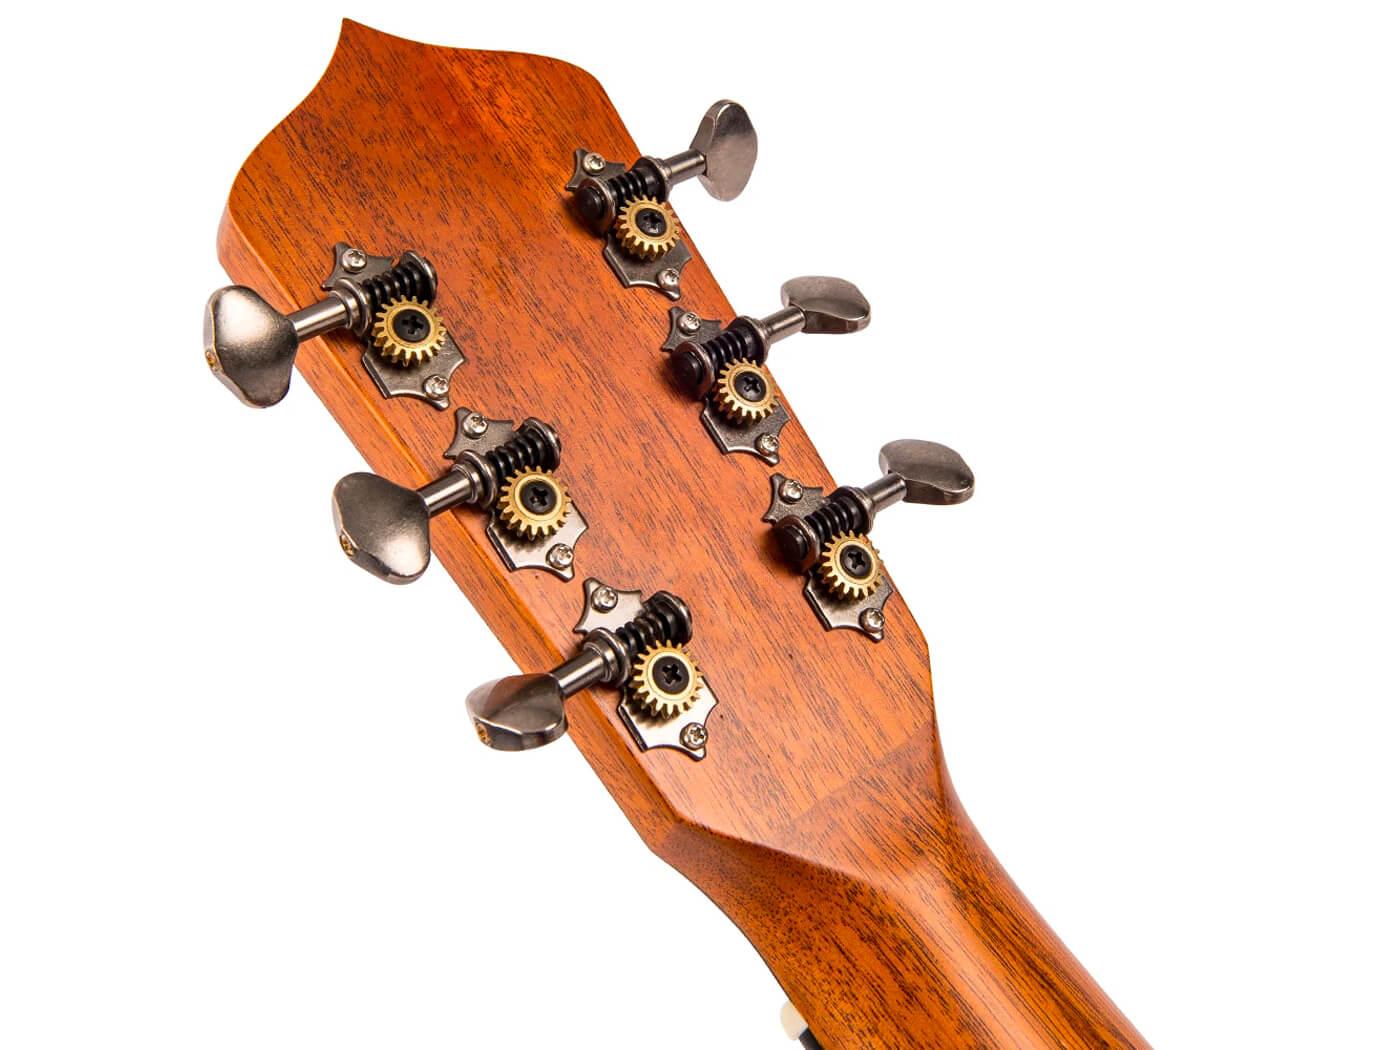 Vintage Guitars Raven headstock